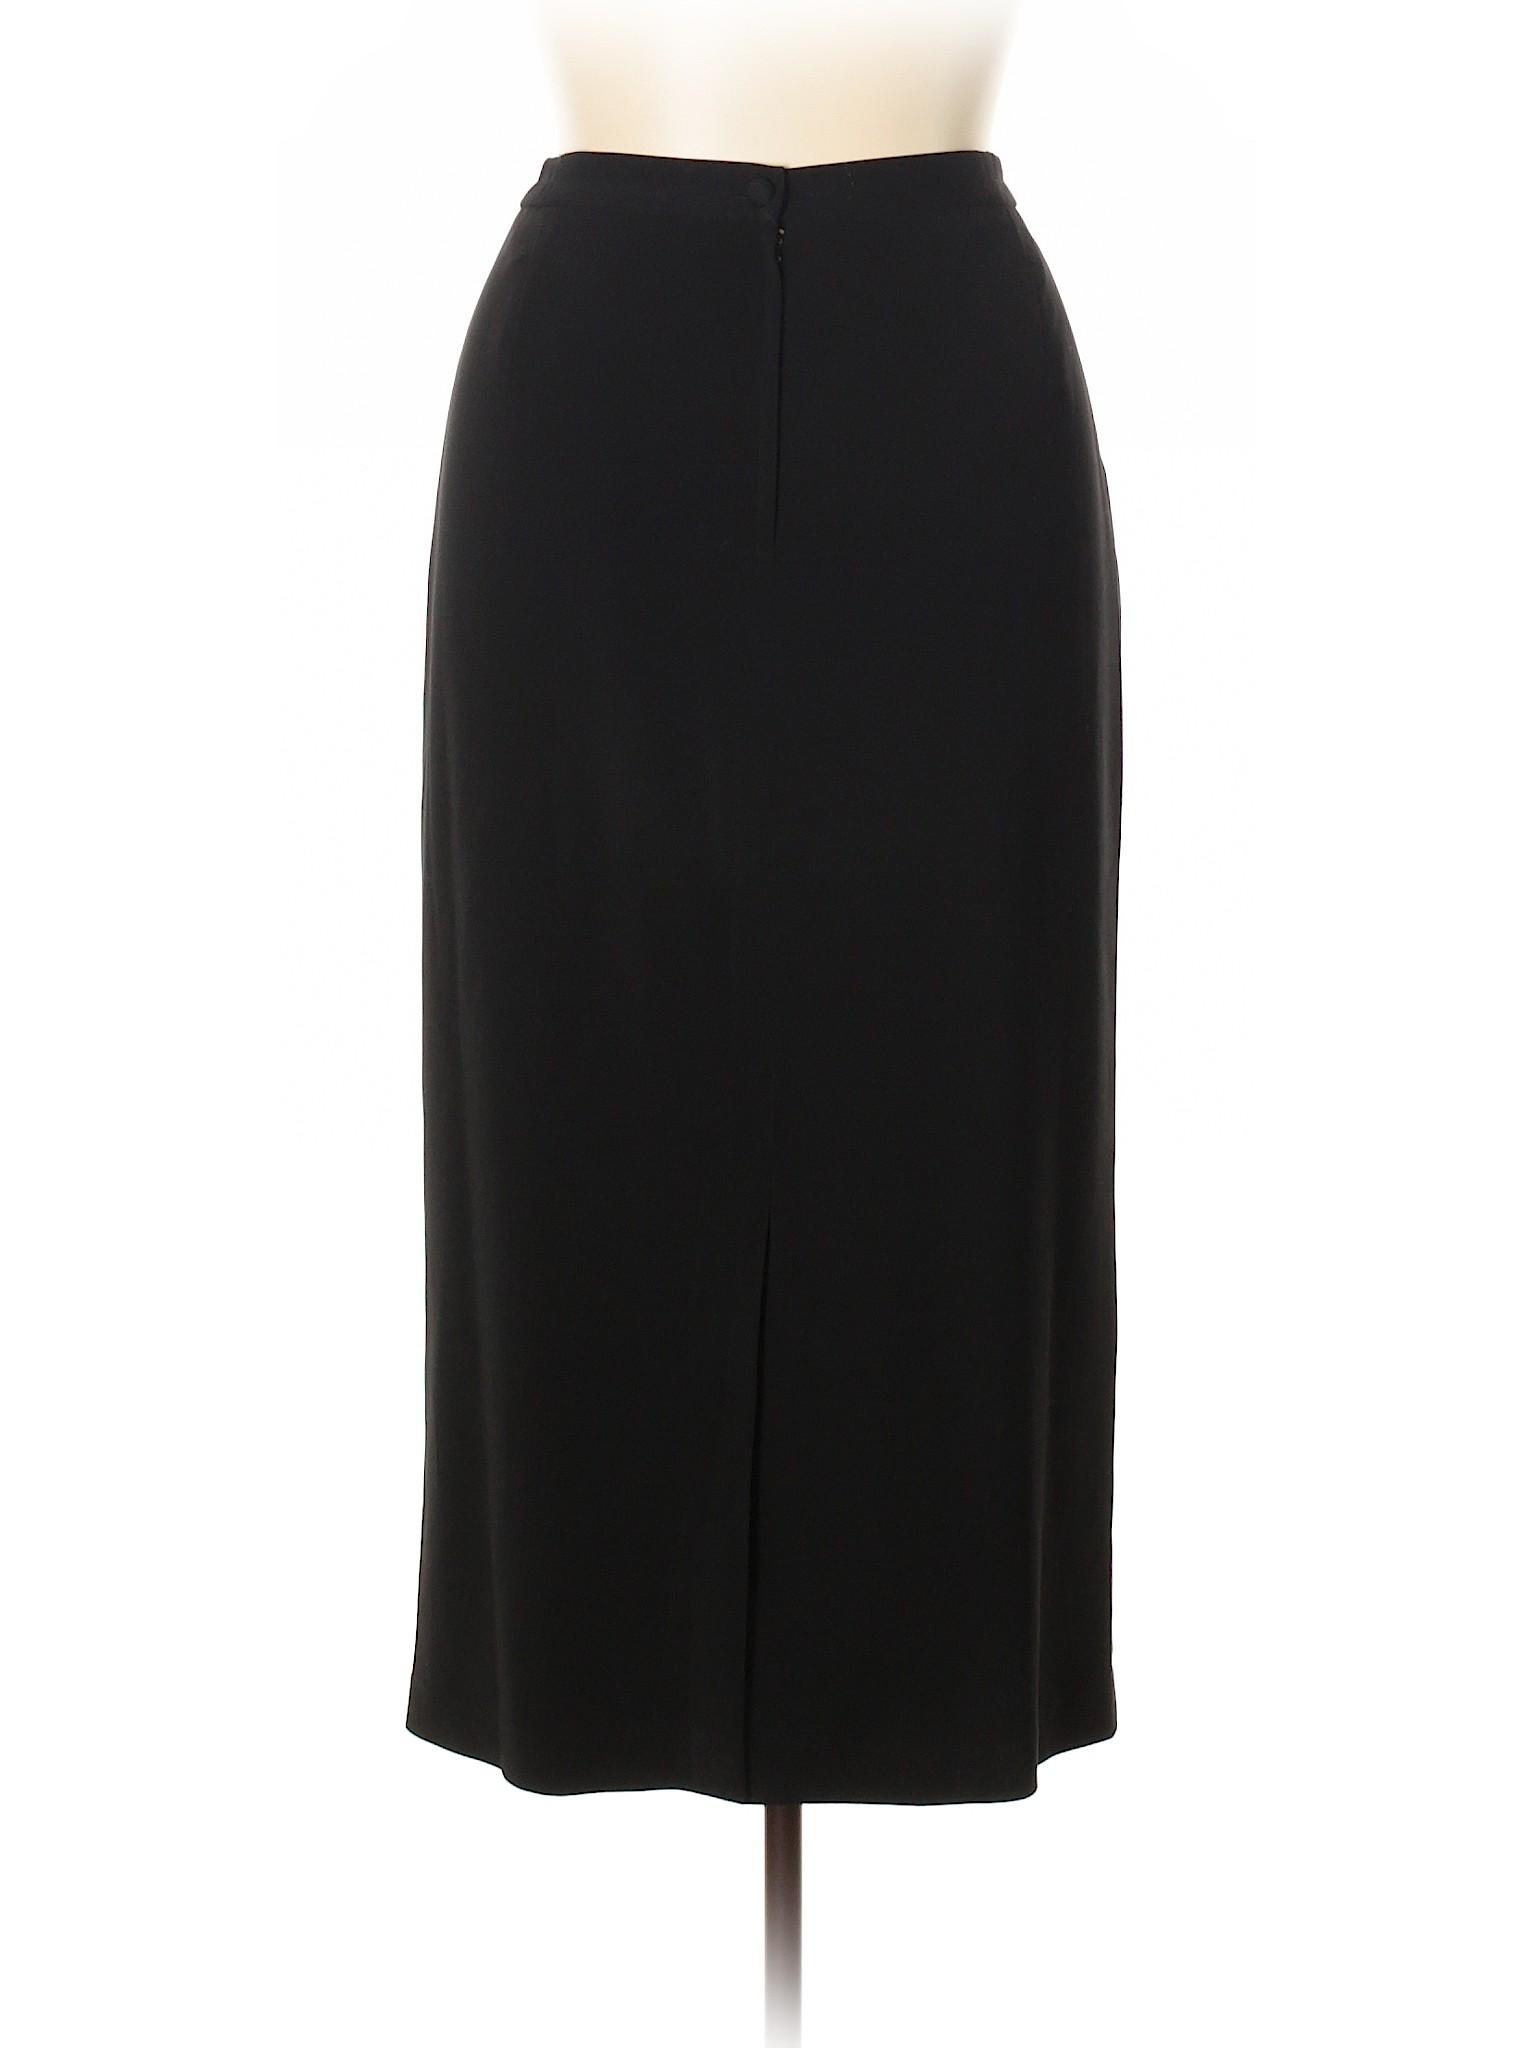 Boutique Casual Boutique Casual Skirt Boutique Casual Skirt Skirt Boutique wExzqFTOC